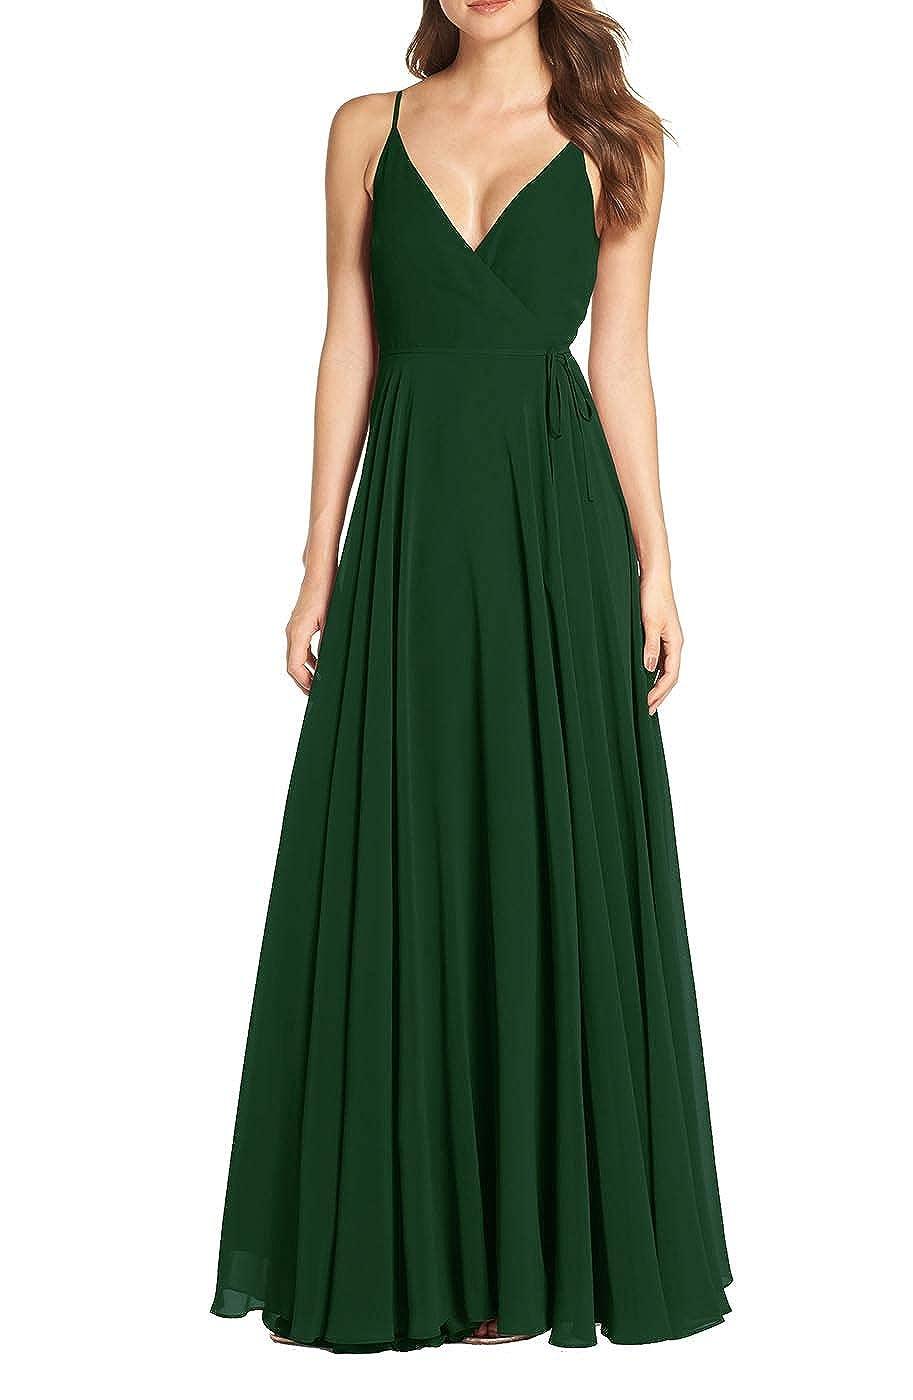 Dark Green RTTUTED Women's V Neck Sleeveless Evening Dresses Long Prom Gown Bridesmaid Maxi Skirt